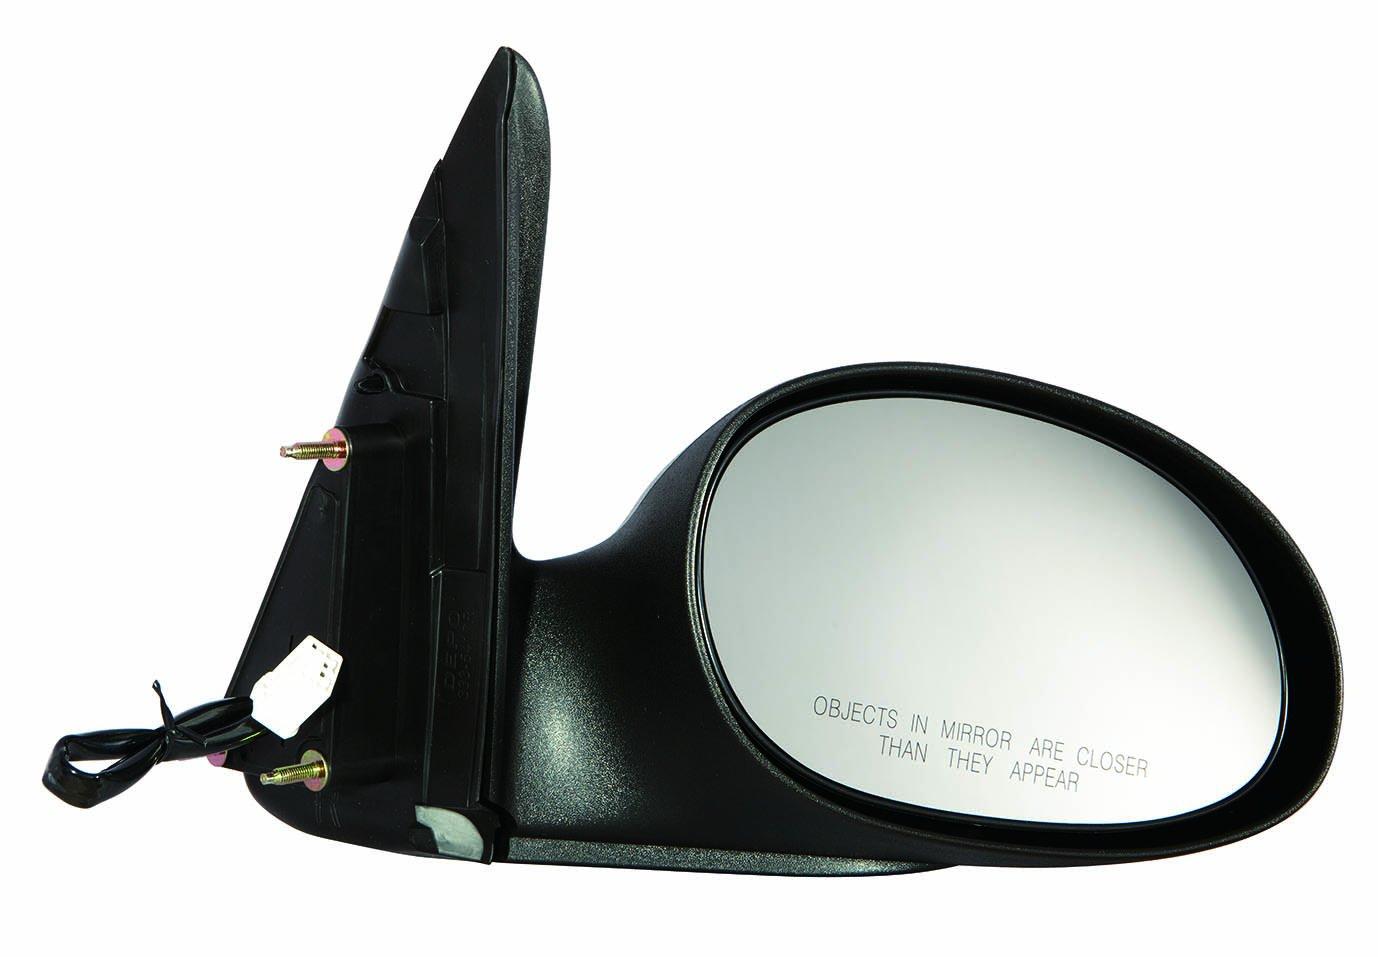 04-10 Without Fold-Away Type 2 Textured Depo 333-5417R3EF Chrysler PT Cruiser Passenger Side Power Mirror